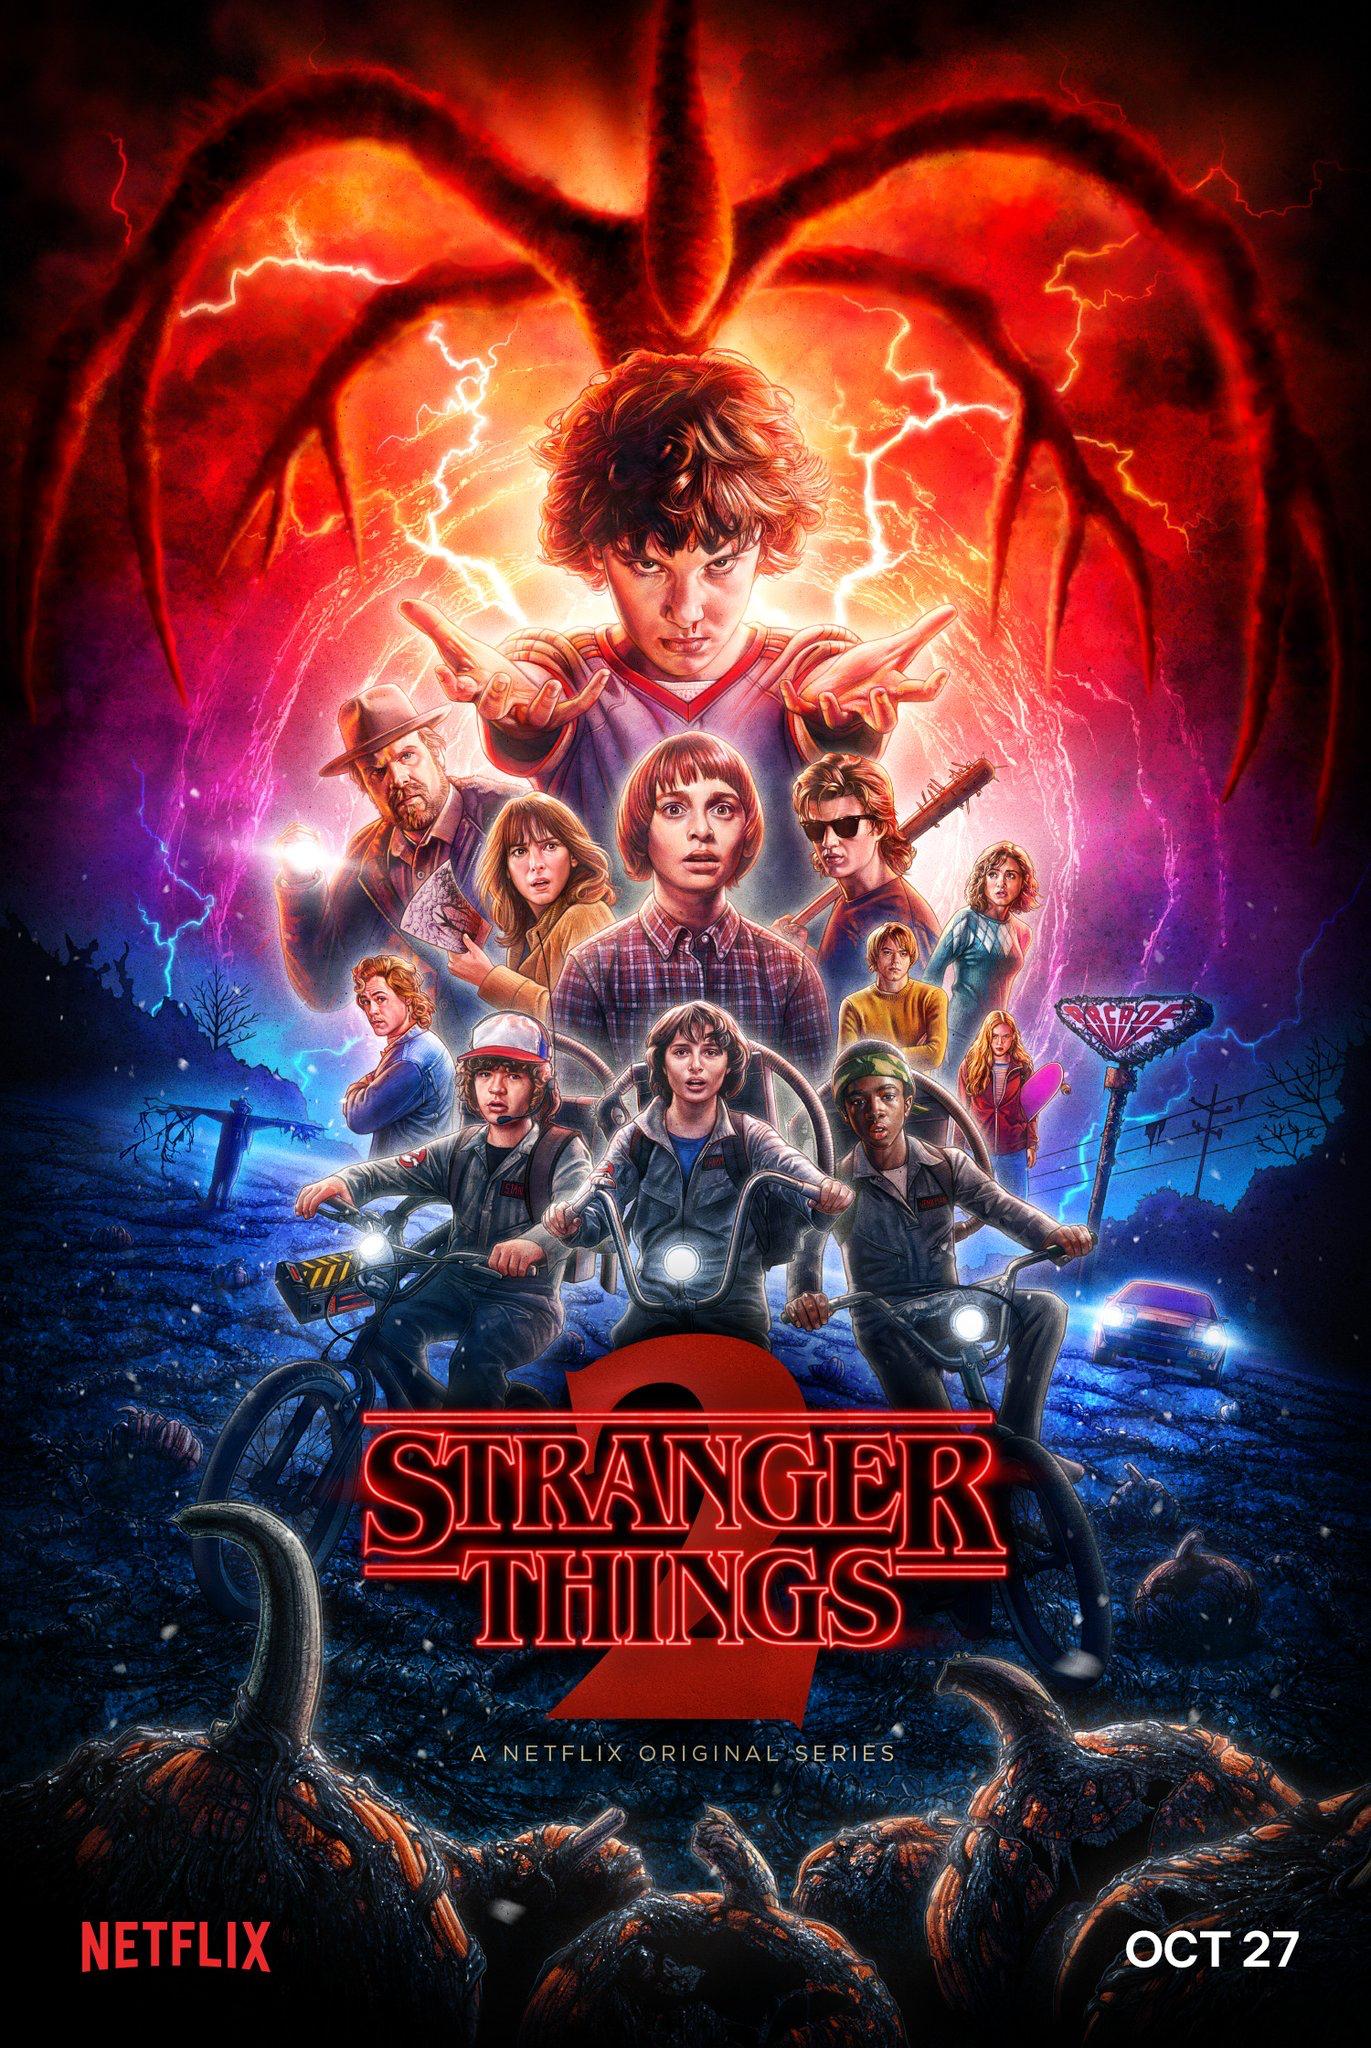 Stranger Things 2 Stranger Things Poster Stranger Things 2 Poster Stranger Things Season